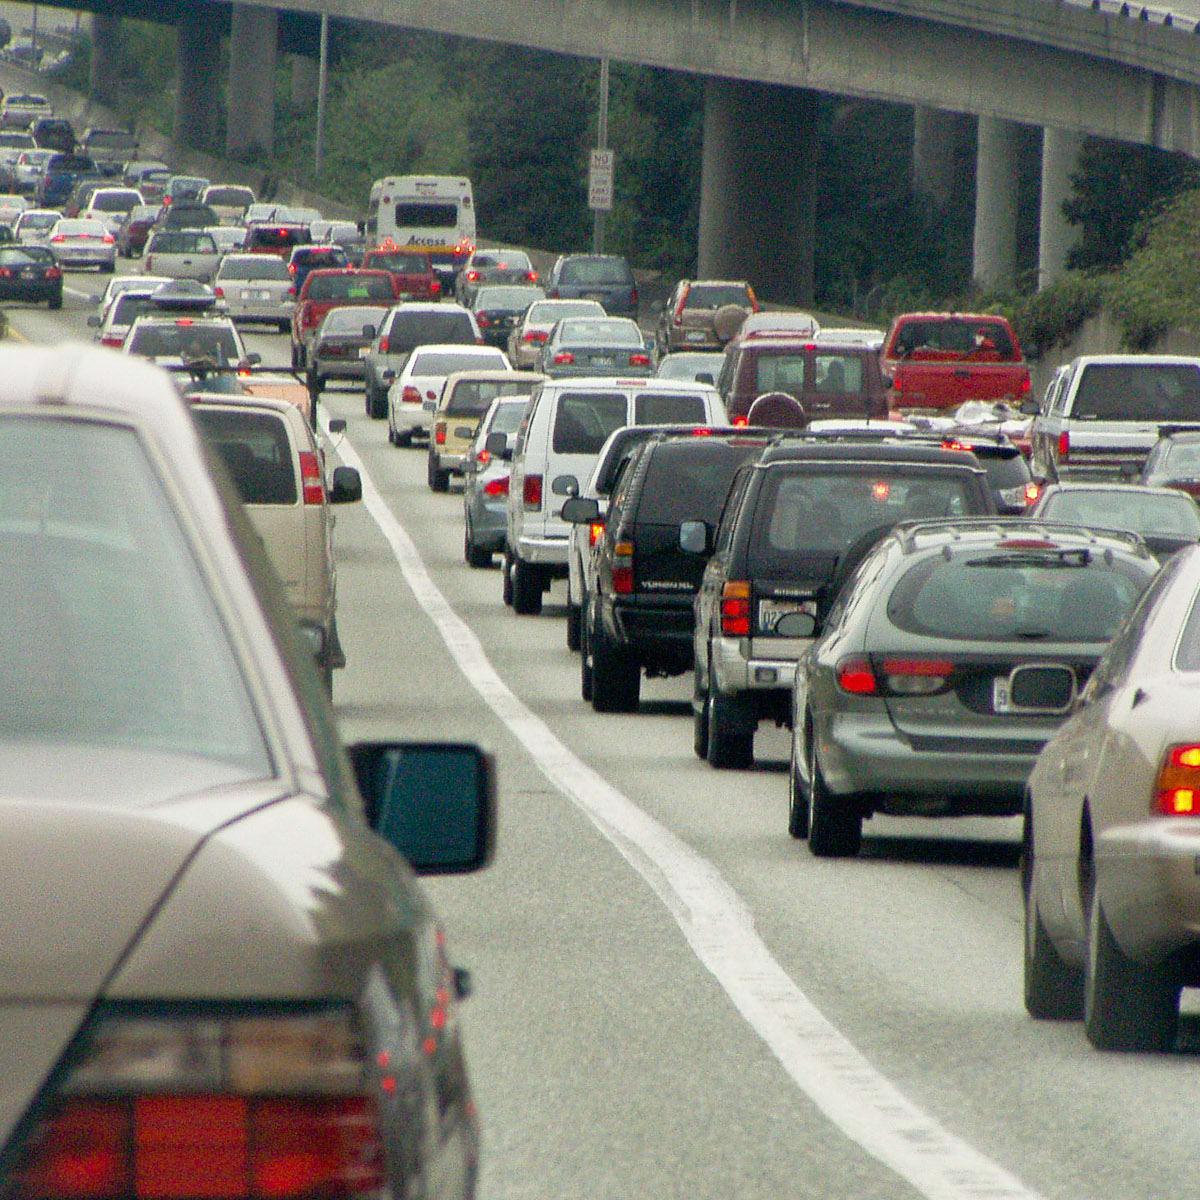 News_traffic jam_cars